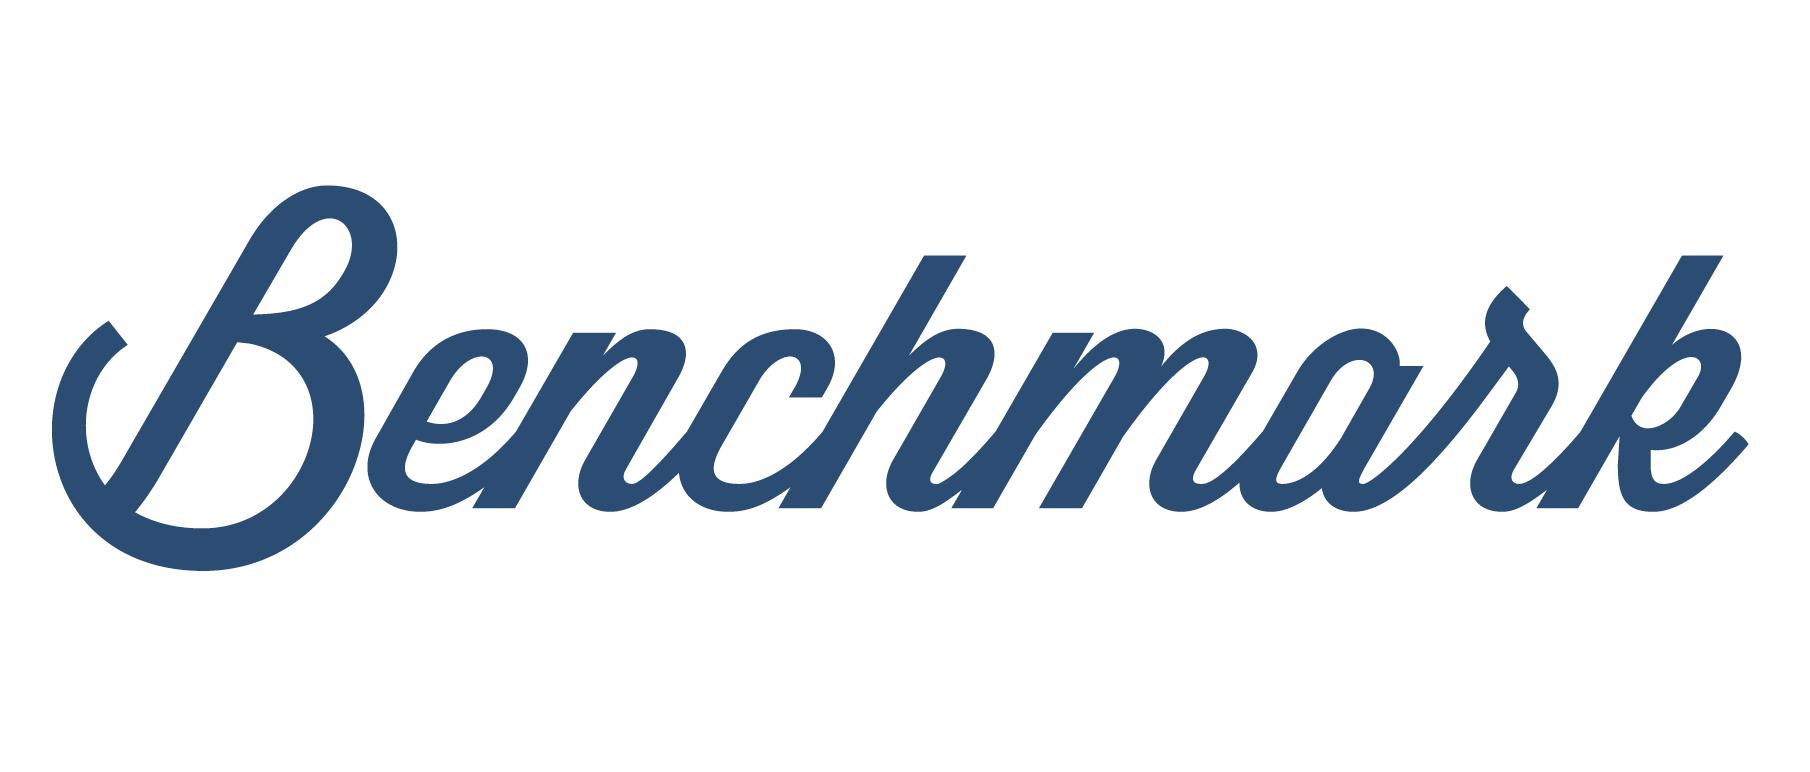 Benchmark mail logo